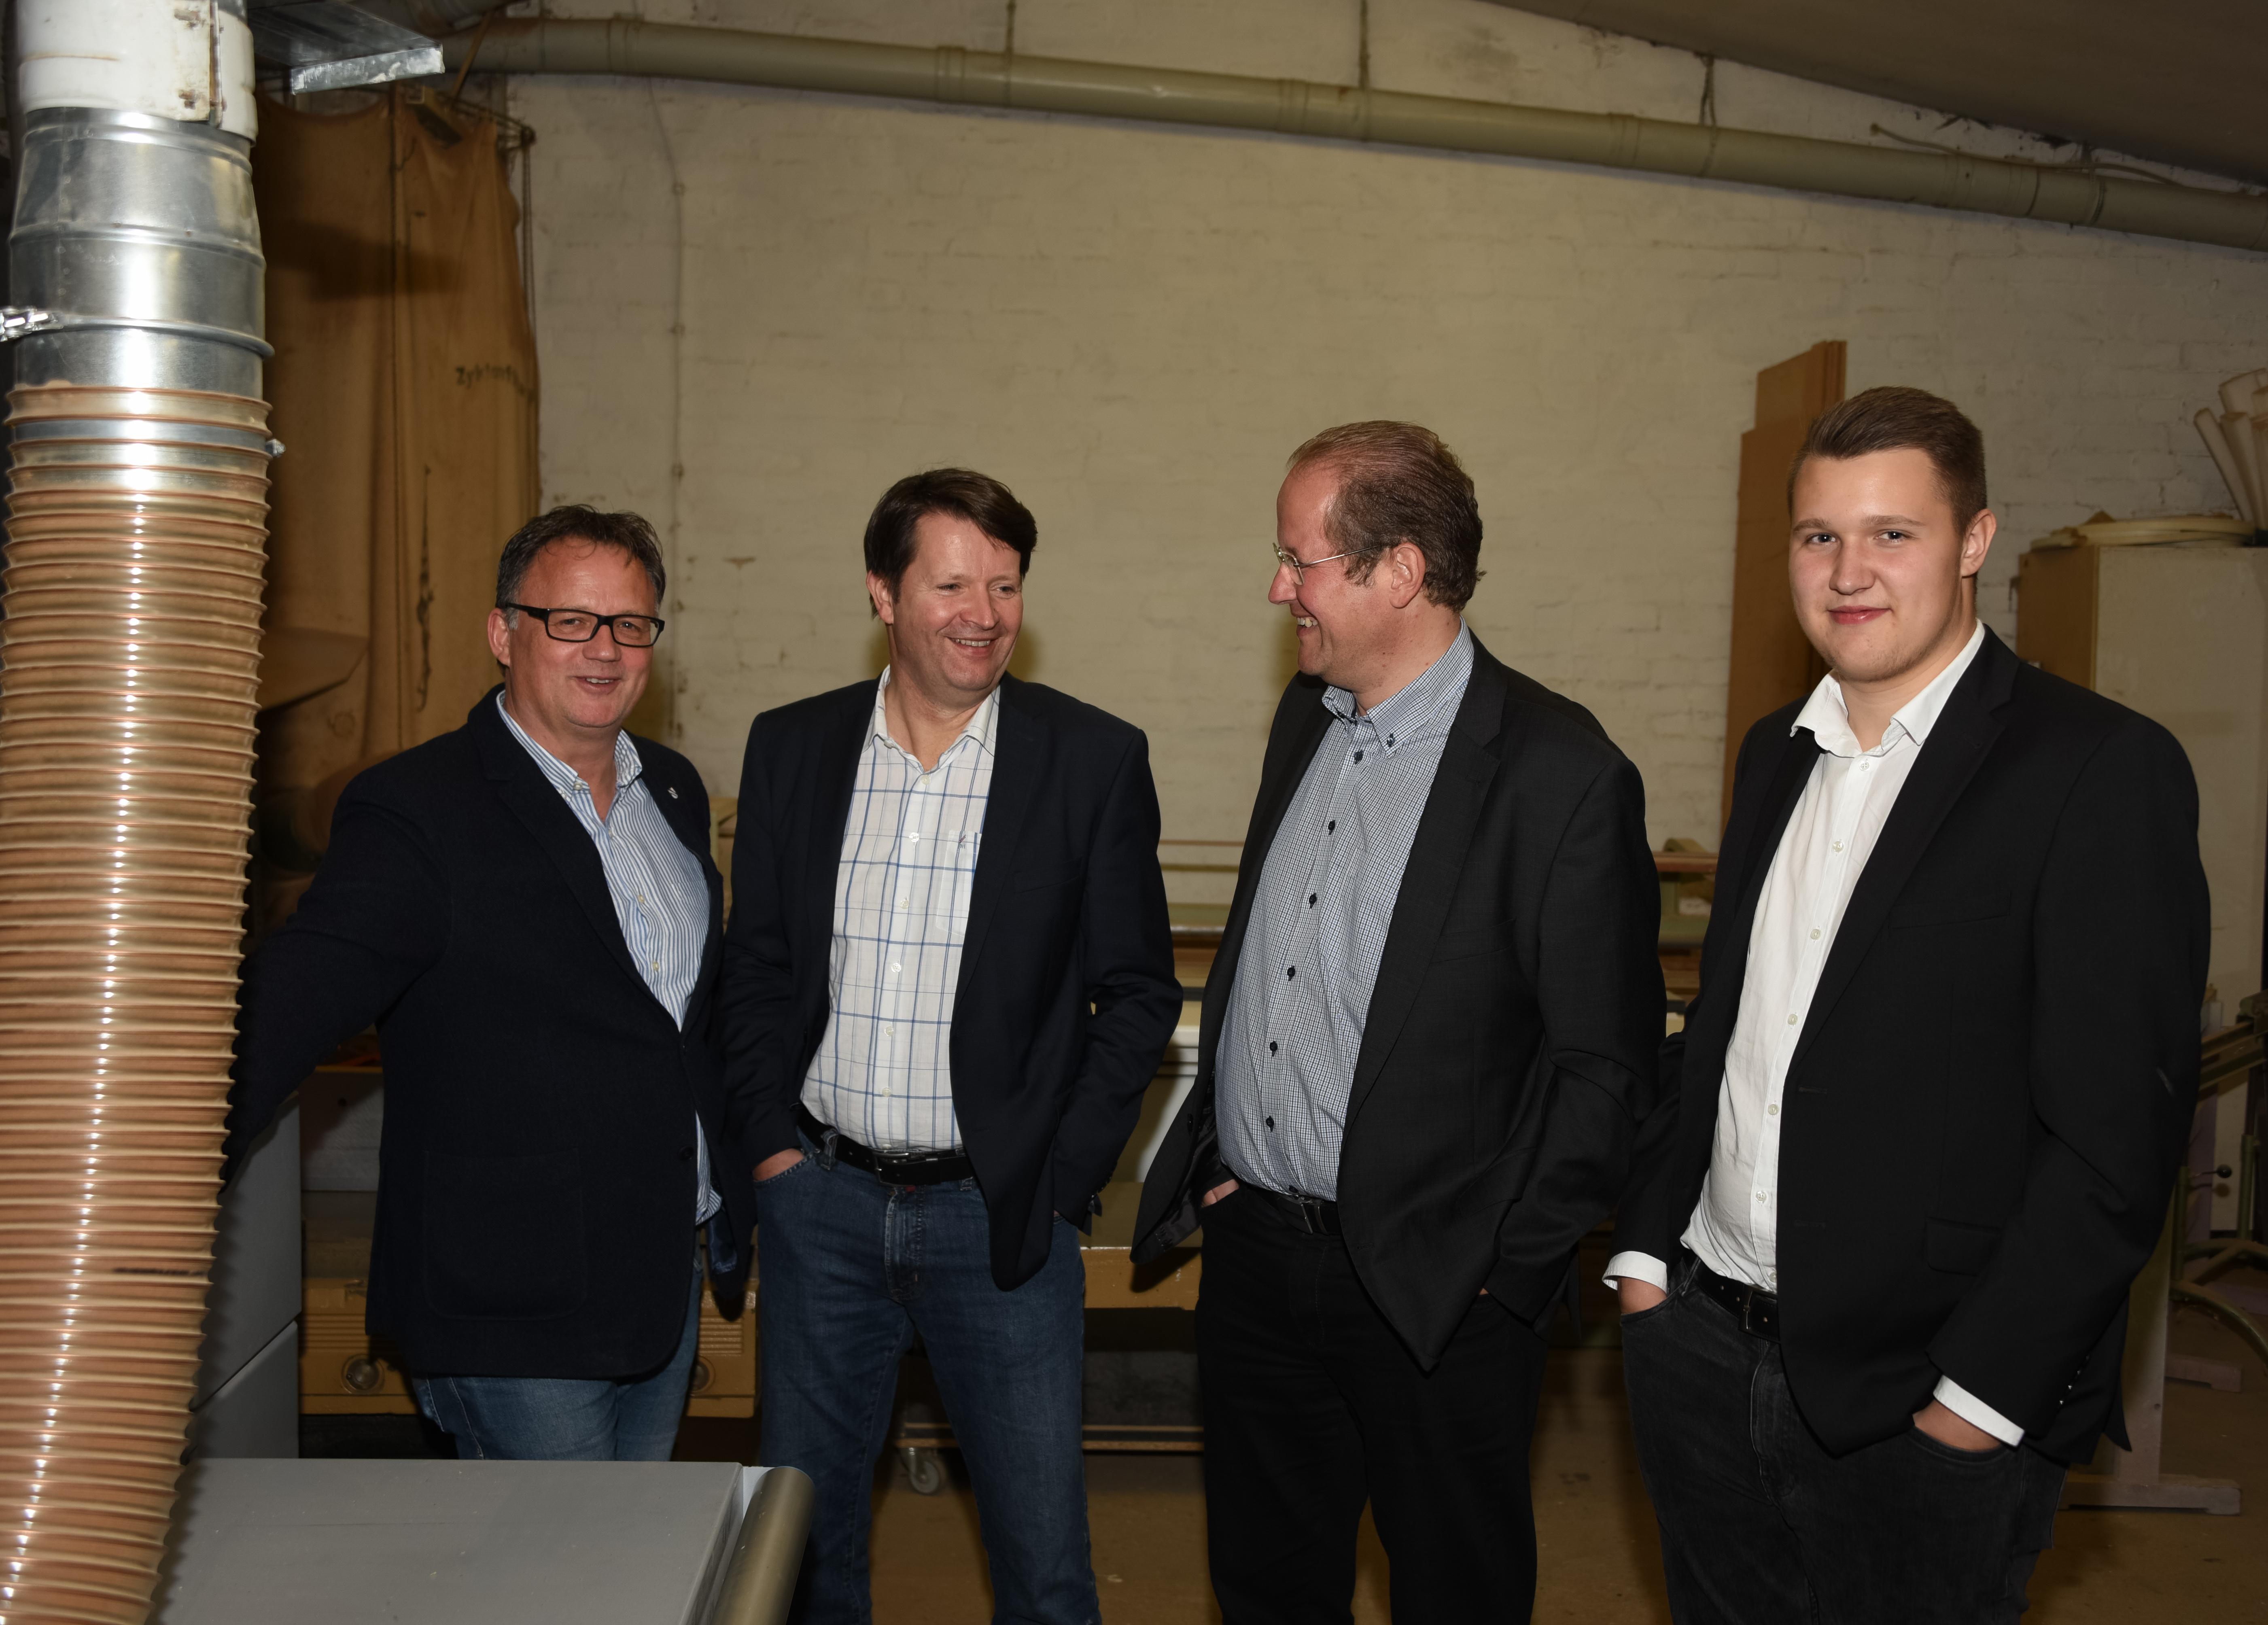 Frank Leibelt, Carsten Niemann, Herren Sinner